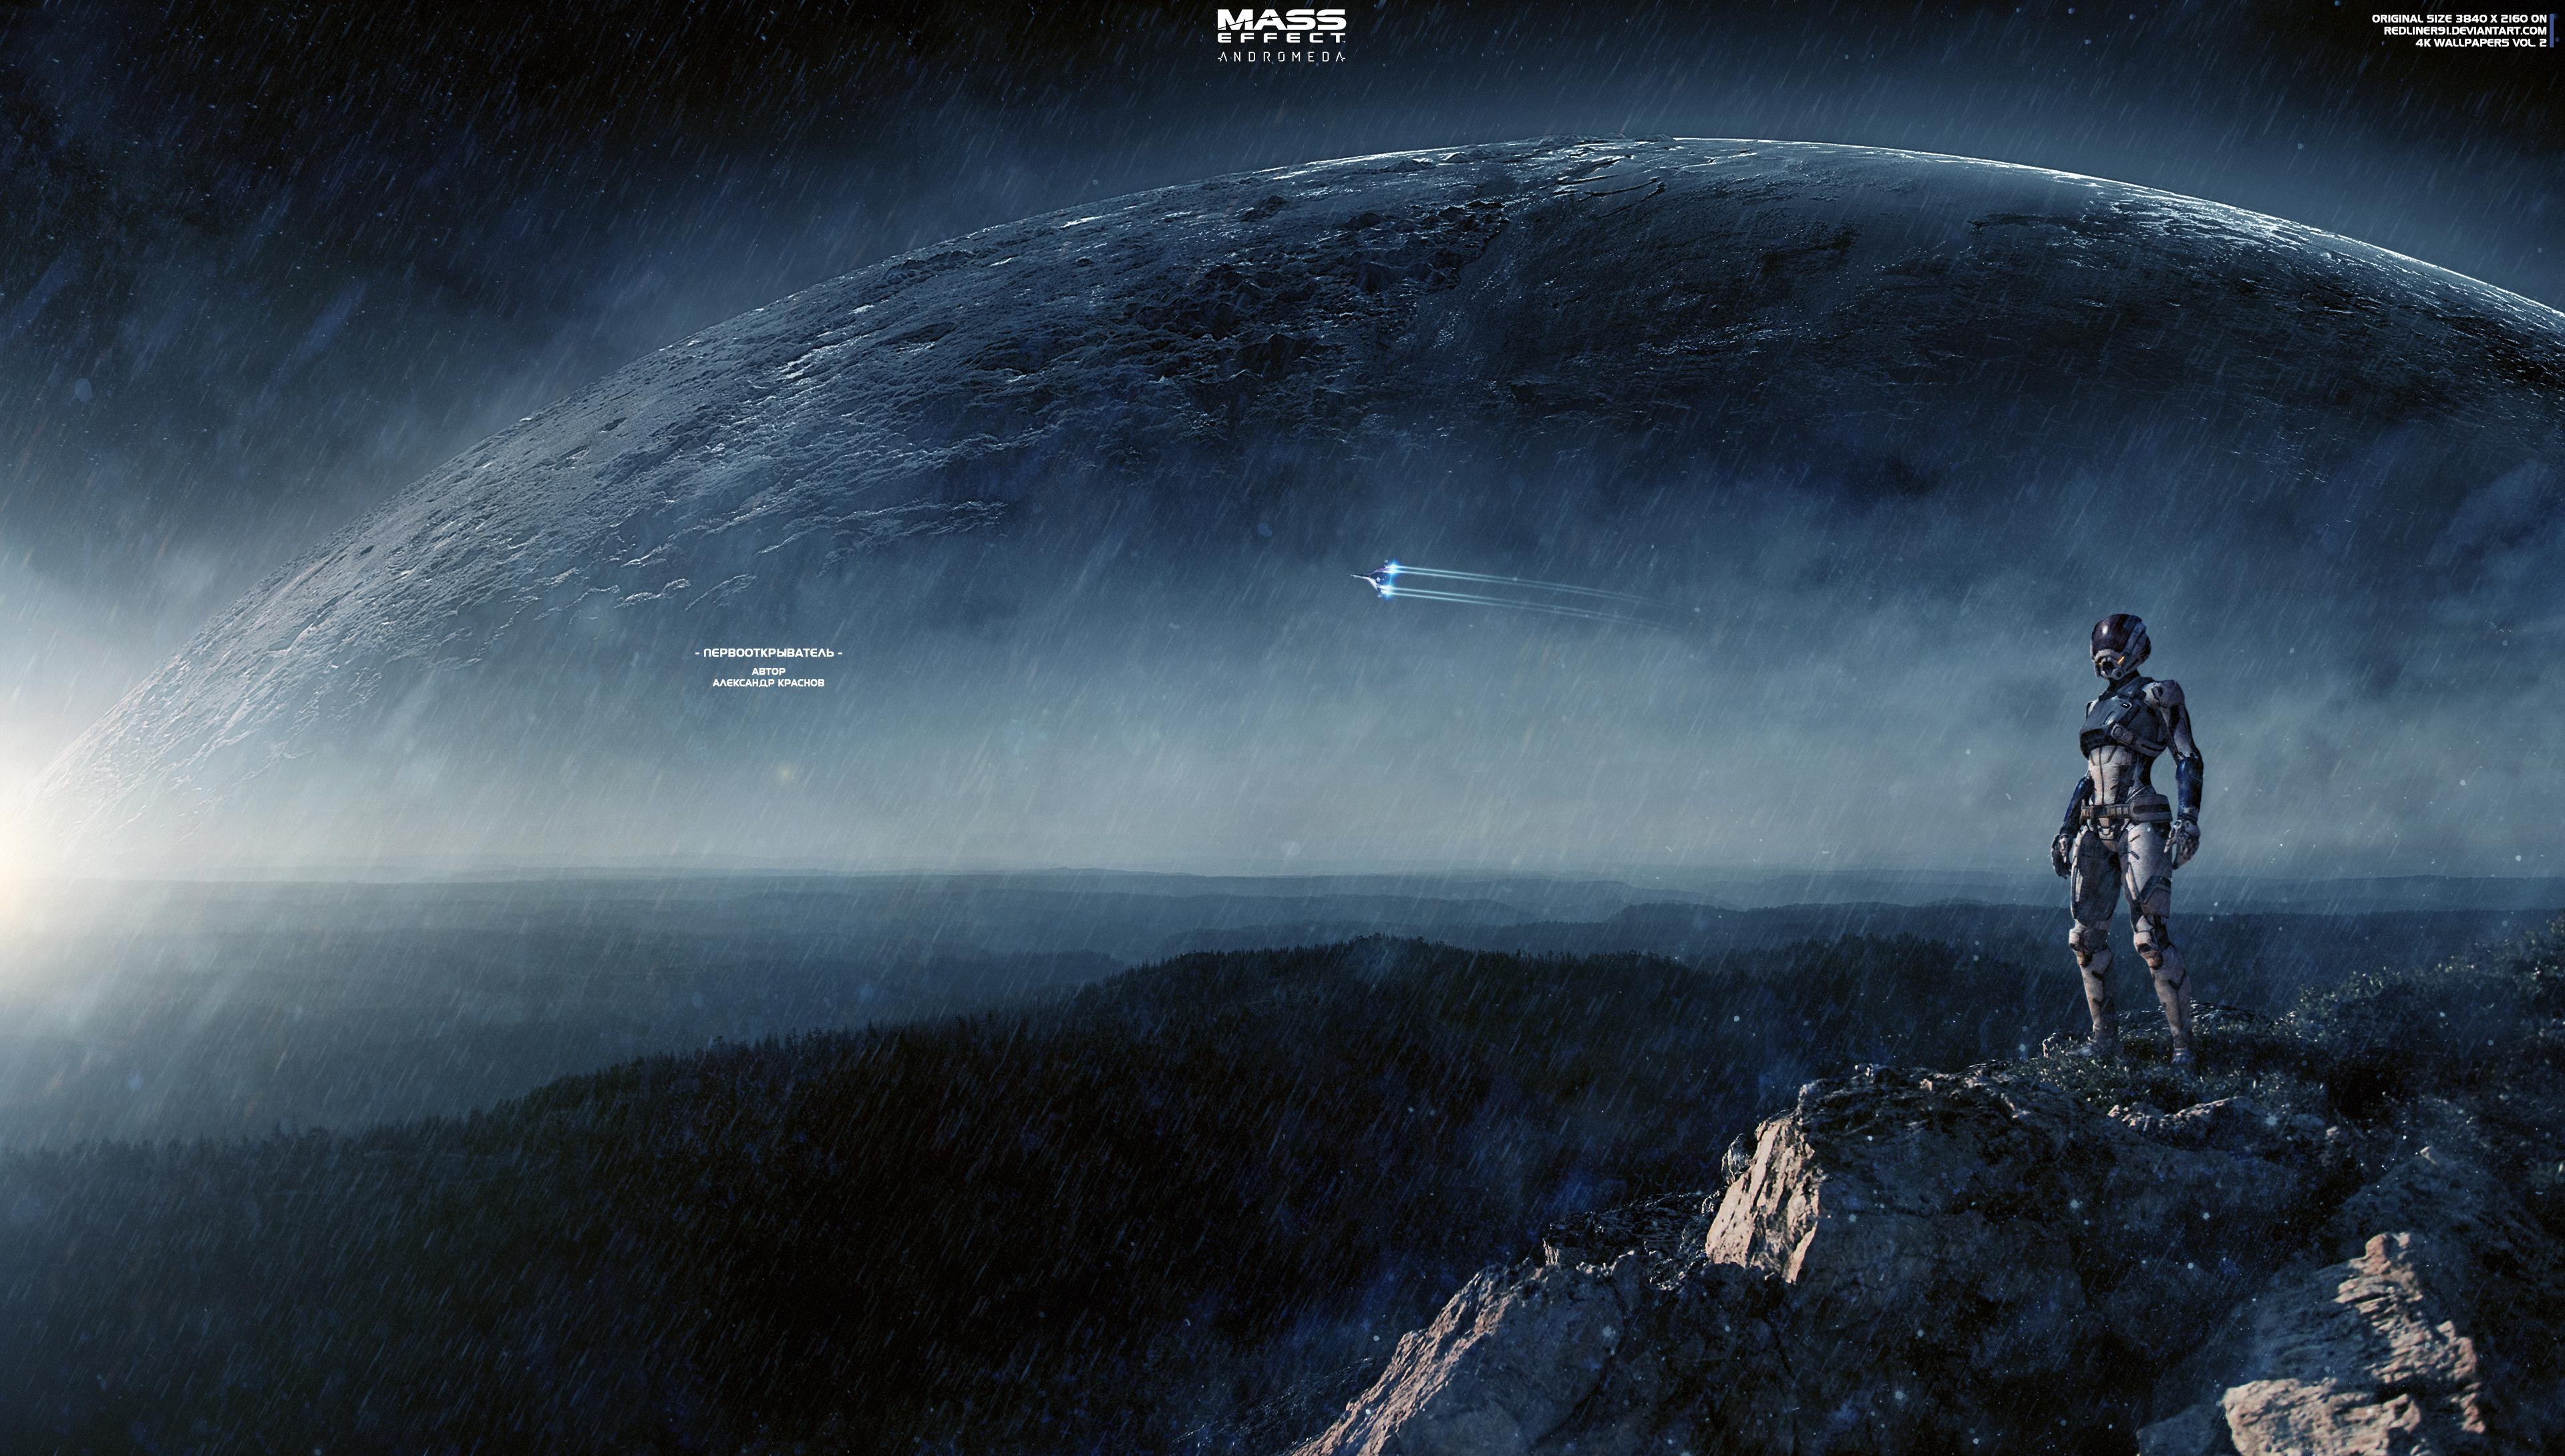 Discoverer Mass Effect Andromeda Wallpapers 4k By Redliner91 On